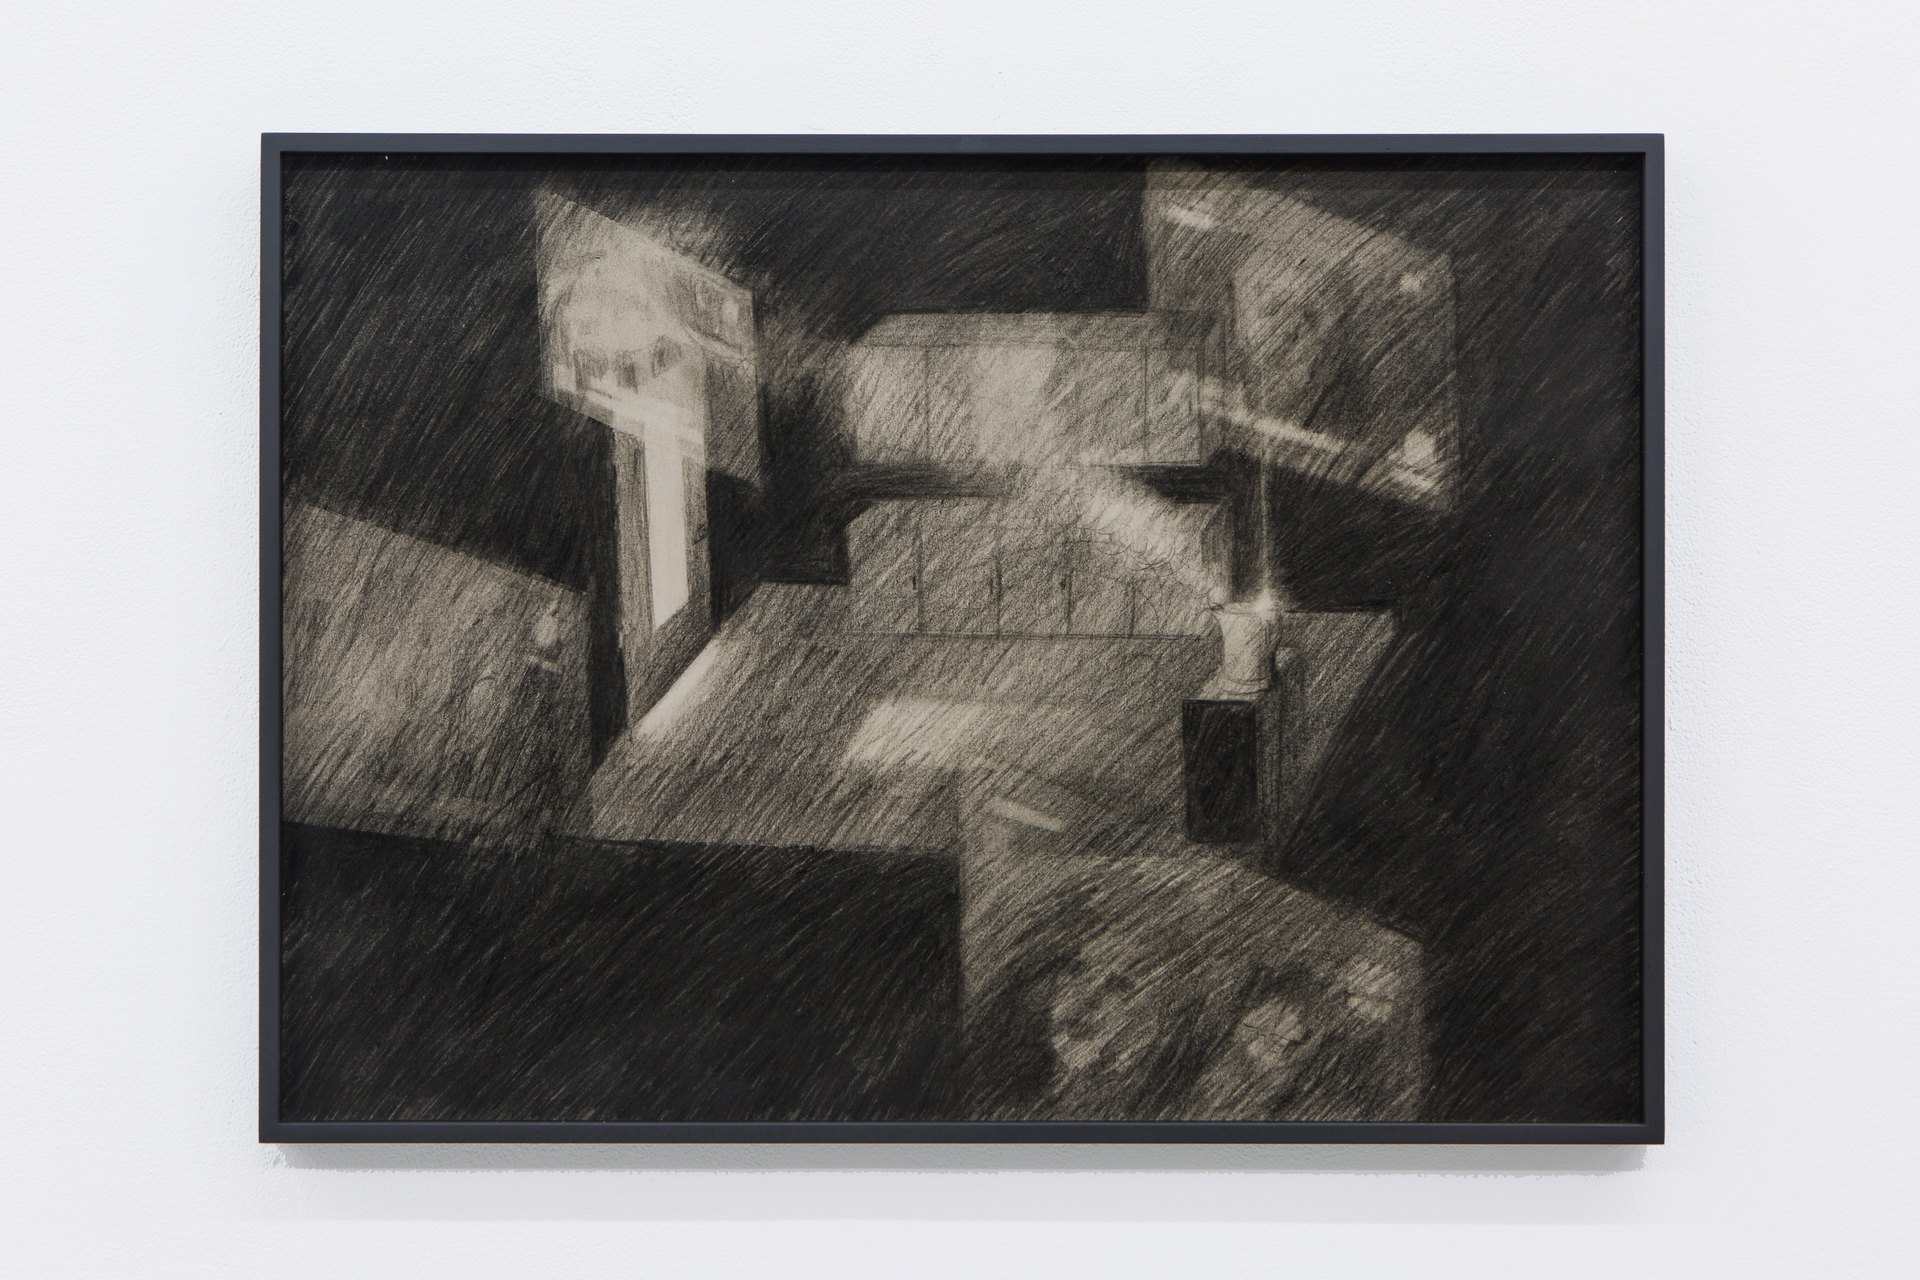 Wojciech Bakowski, 'The Eagle', 2017, No, No, No, No, 2018, Cell Project Space